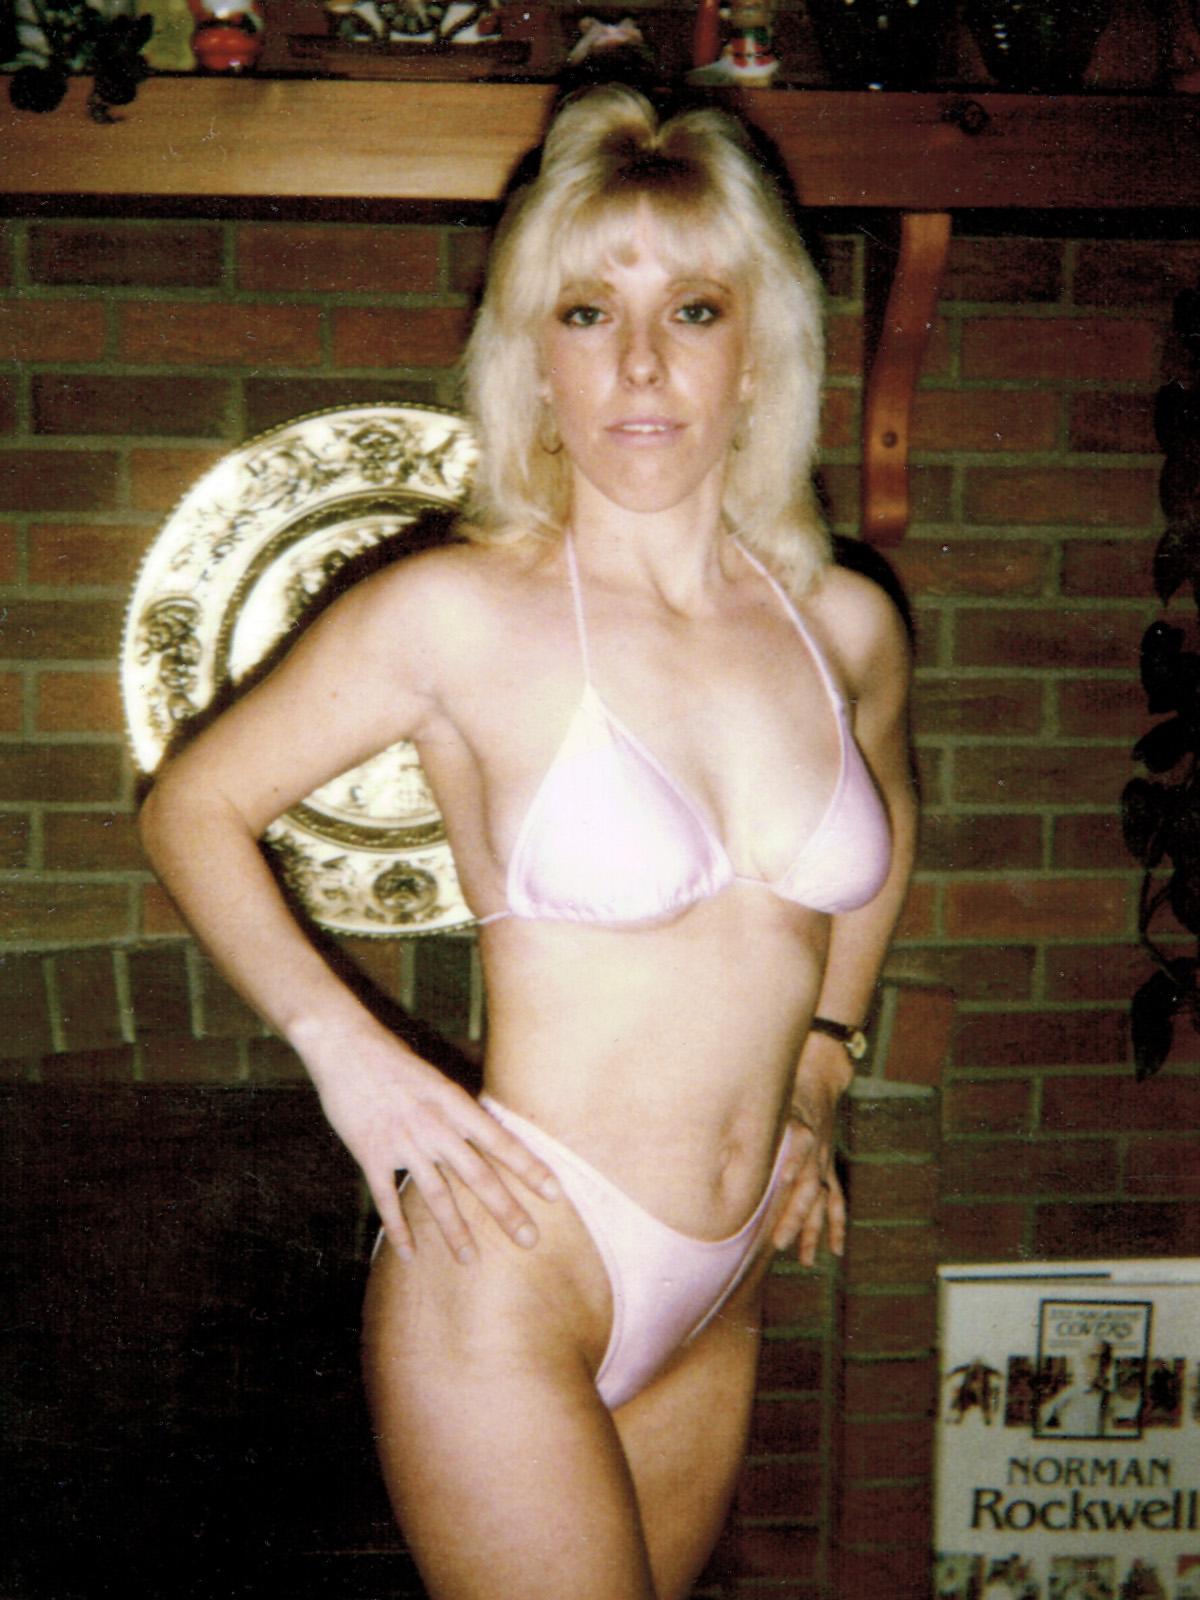 Polaroid Fuck - Posing For The Polaroid in 1985 | Carol Cox: Diary Of An ...